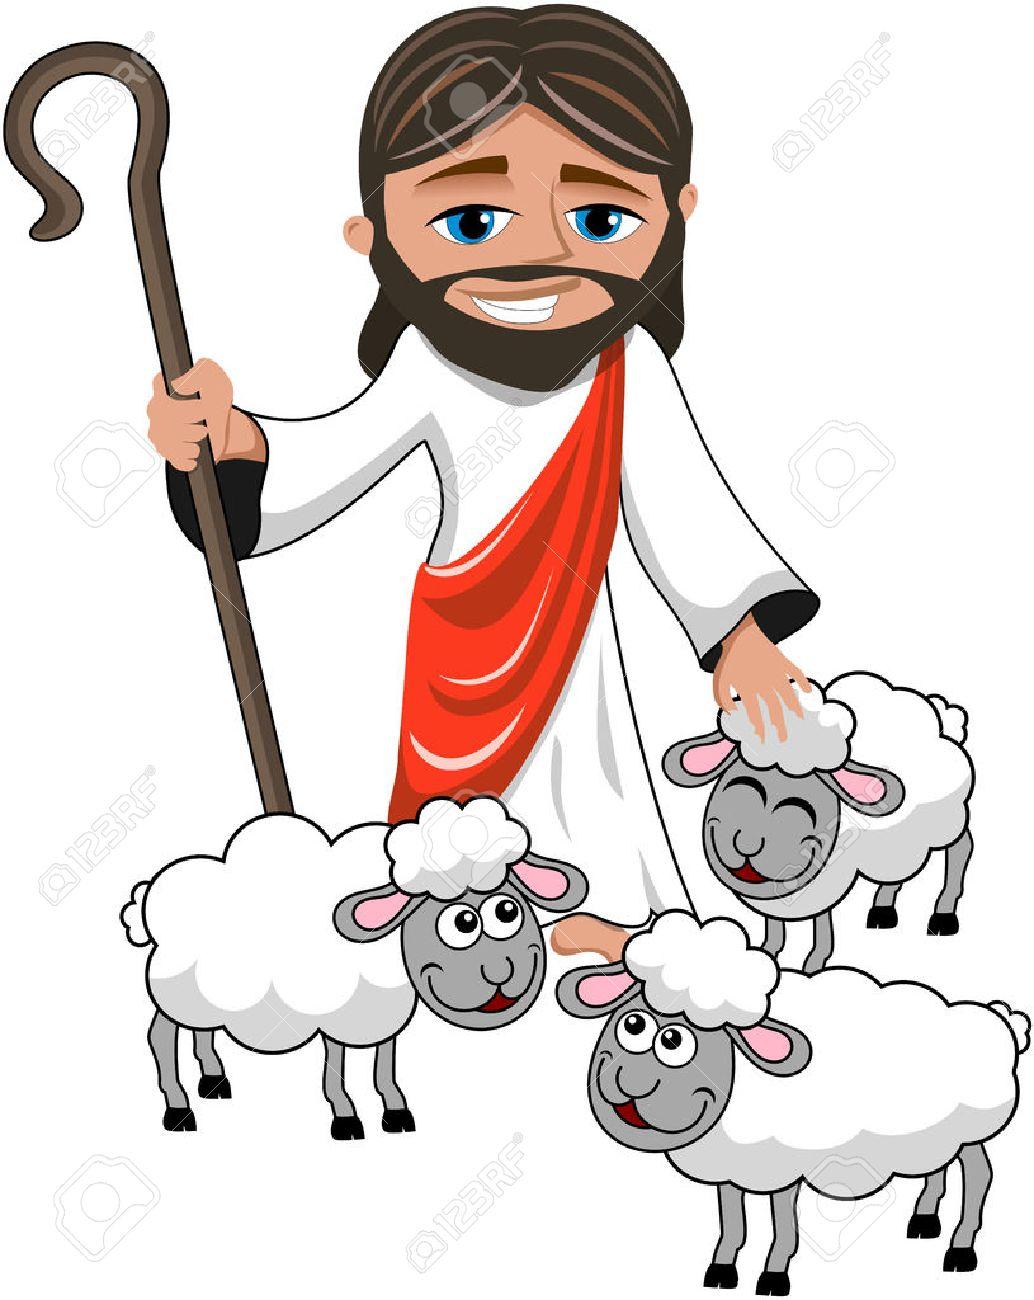 1034x1300 Shepherd And Sheep Clipart 44119087 Cartoon Smiling Jesus Holding